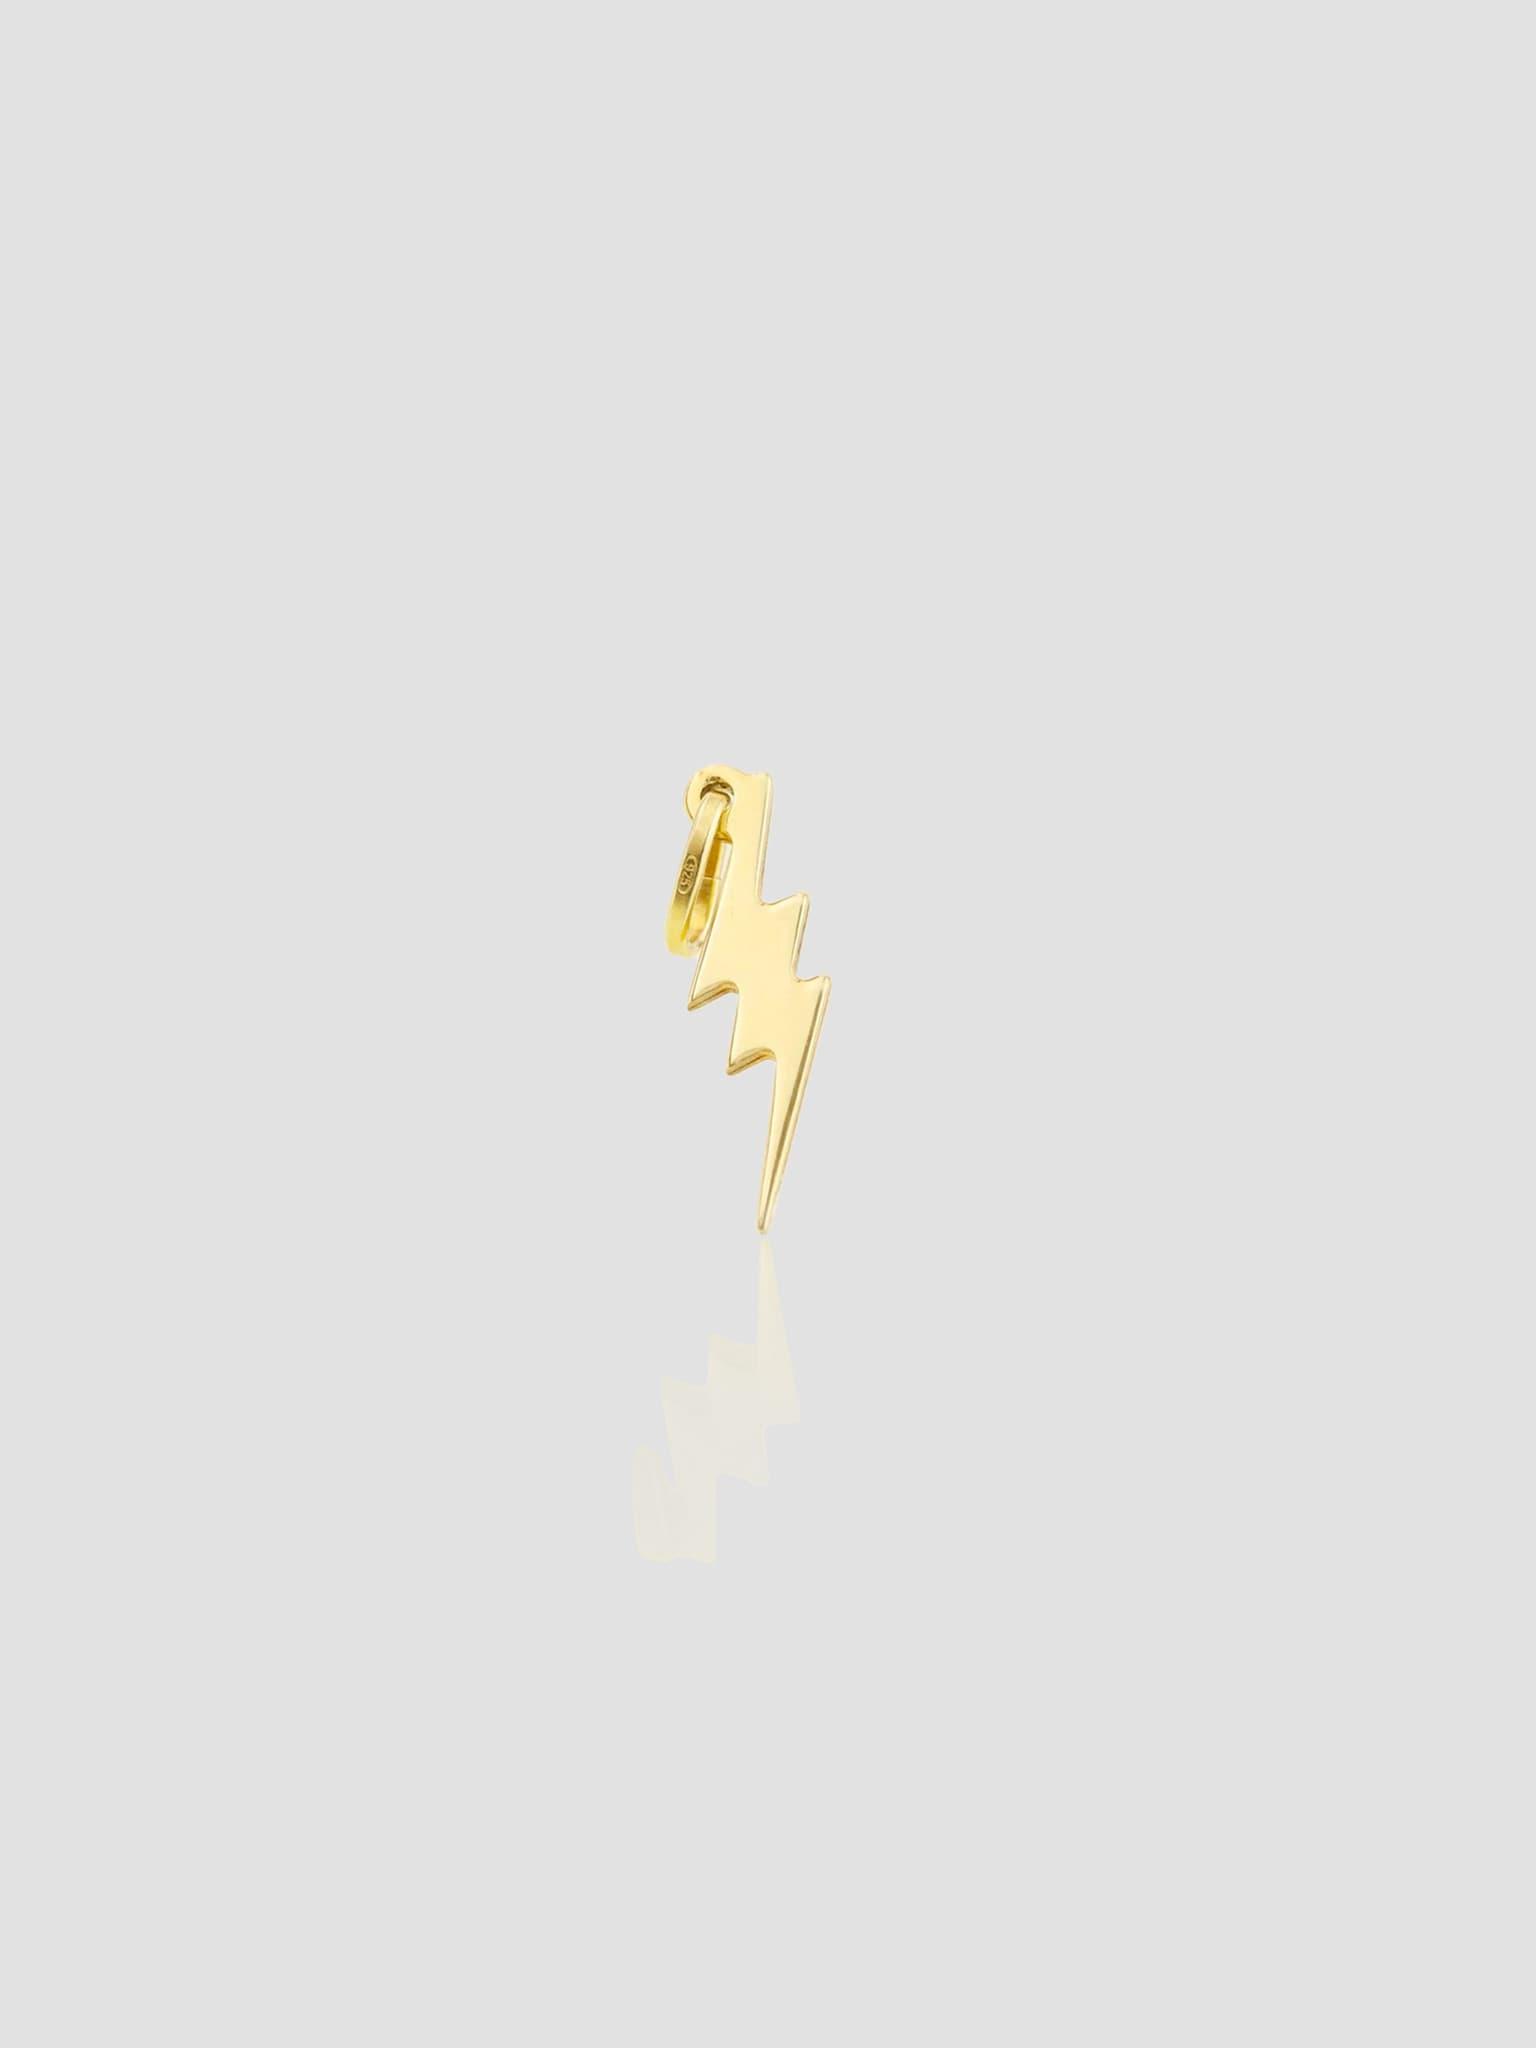 Thunderbolt Pendant One size 14k Gold